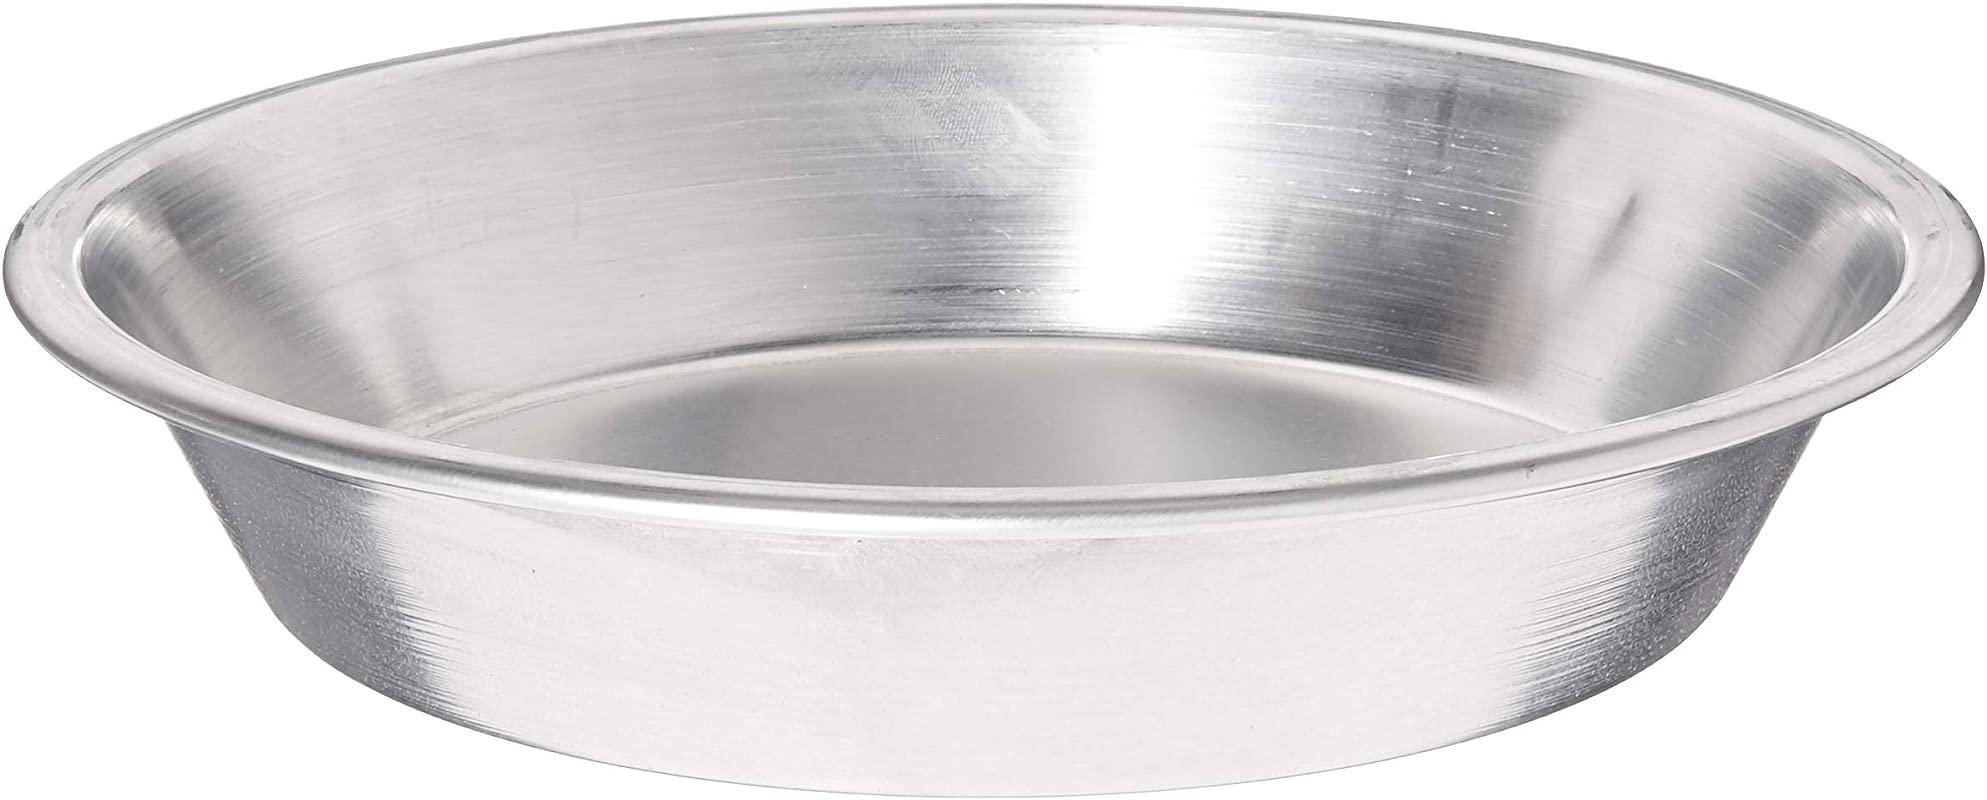 American Metalcraft 9 87 Inch Deep Dish Aluminum Pie Pan